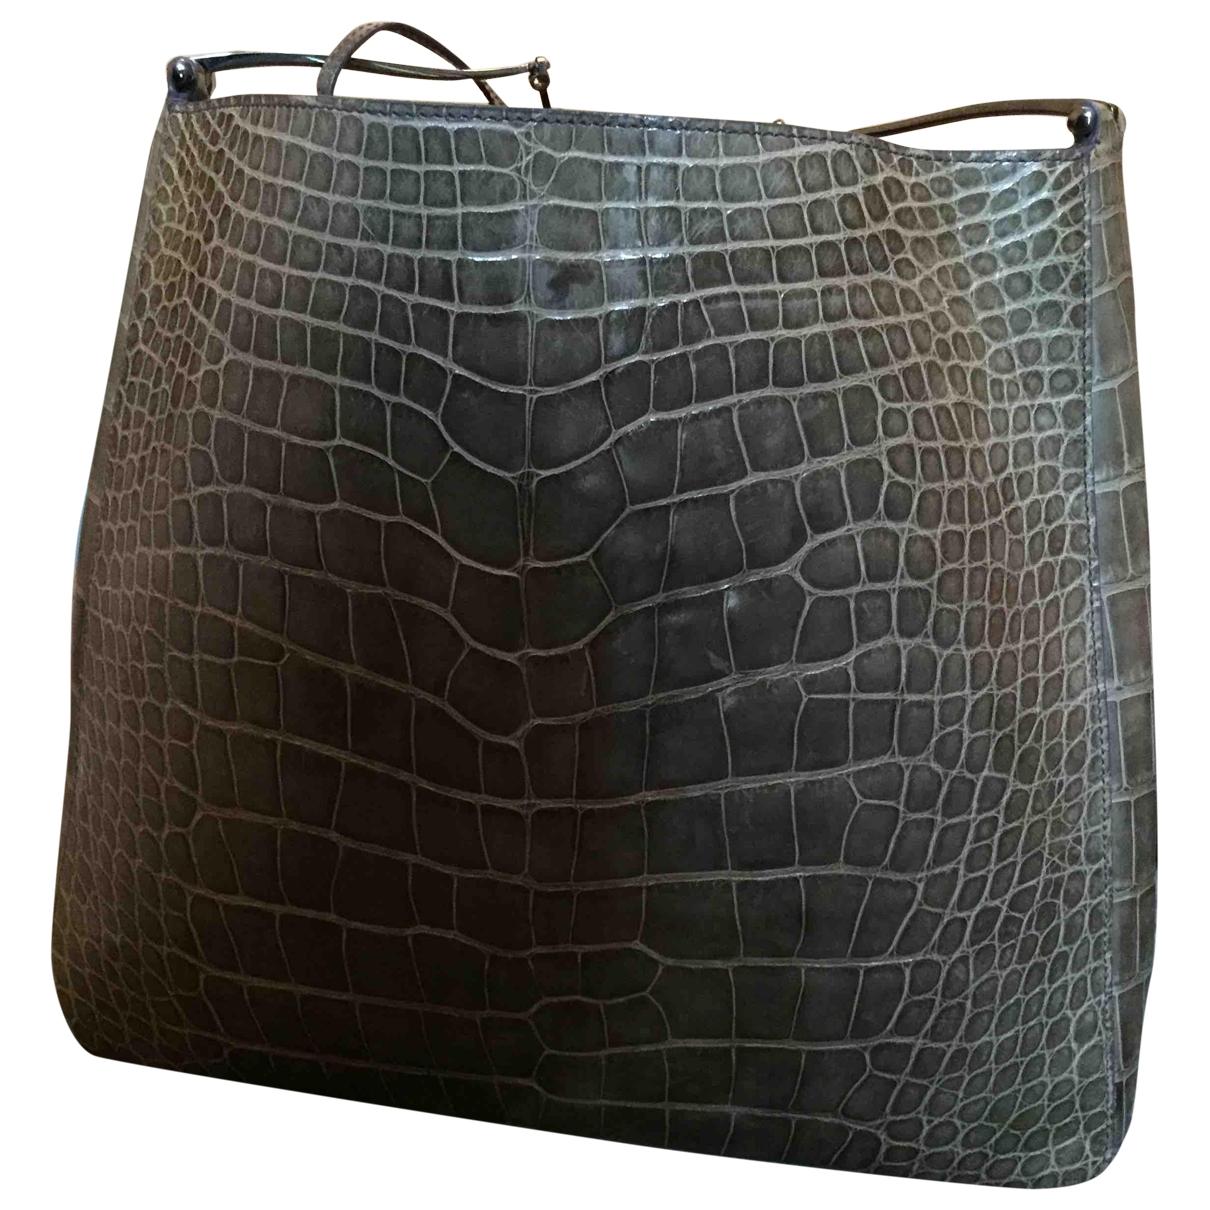 Gucci \N Handtasche in  Beige Aligator